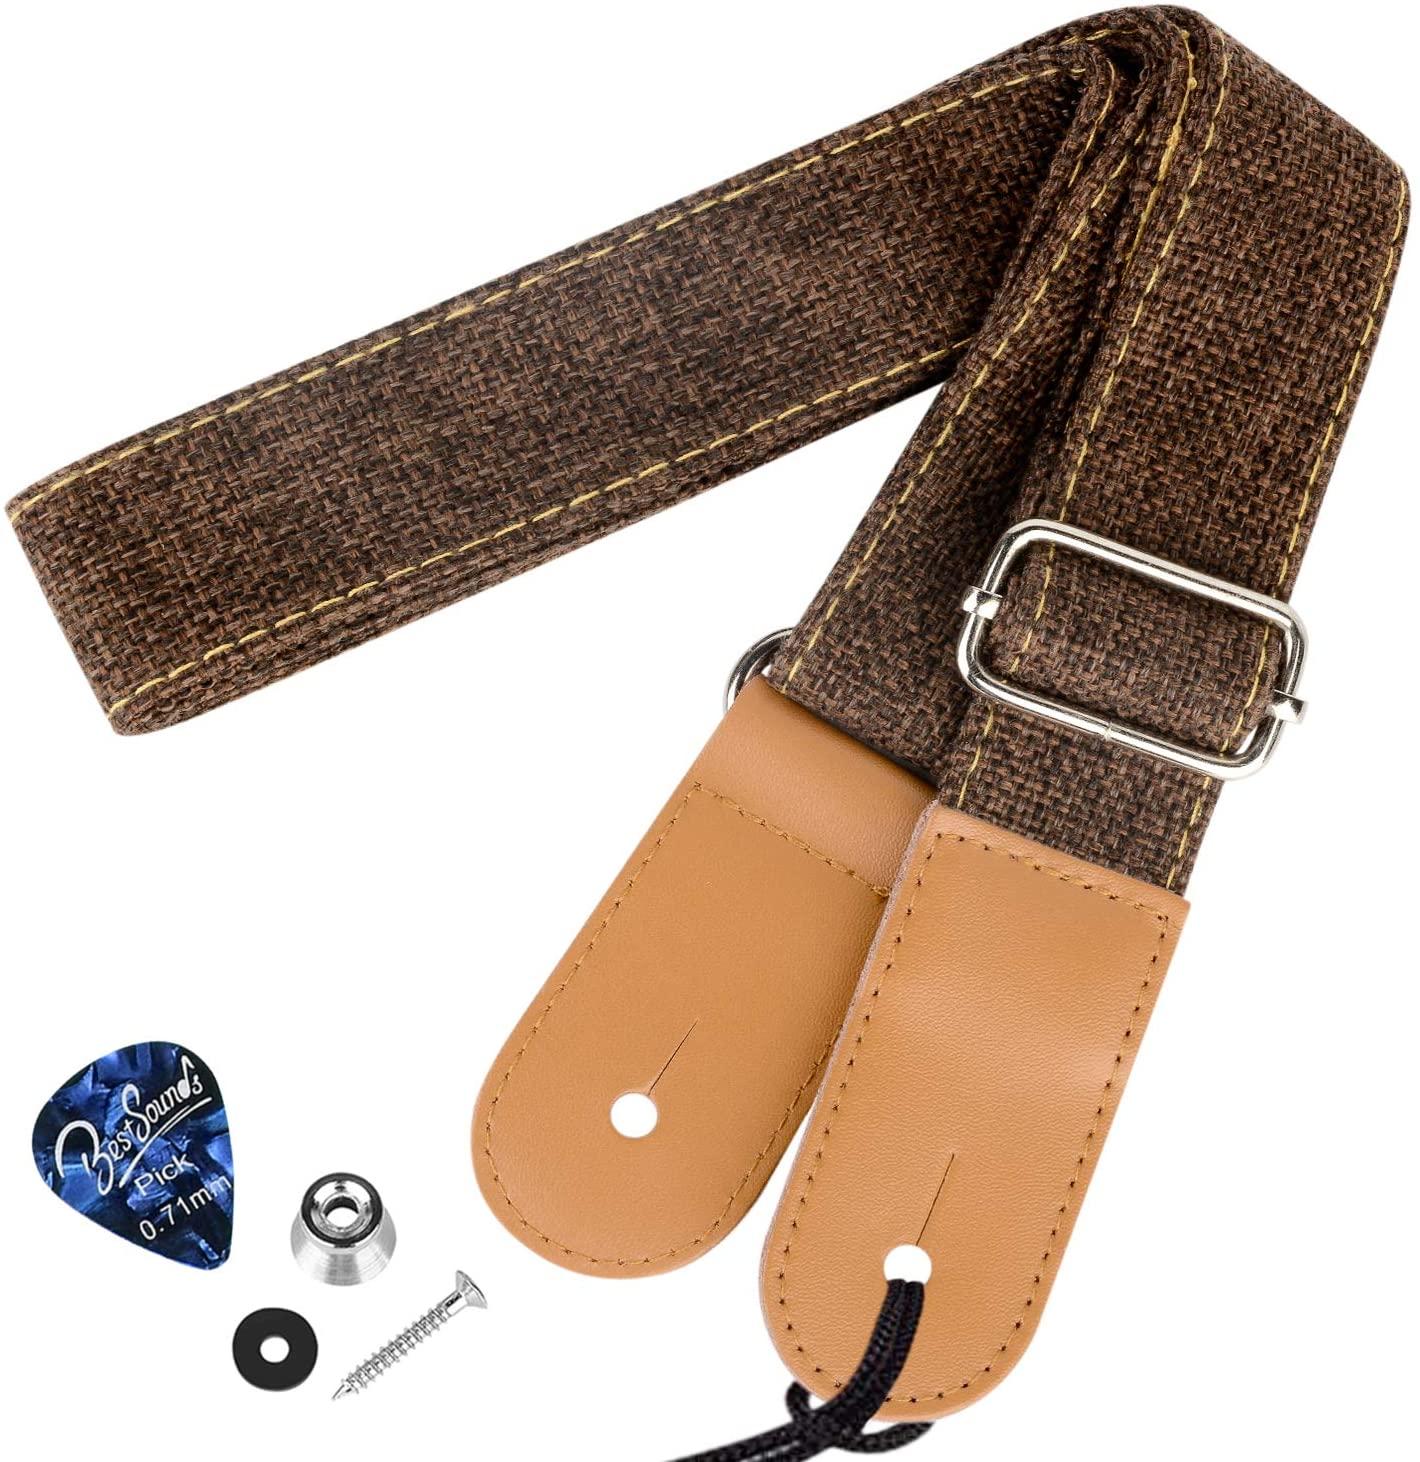 Dulphee Ukulele Strap with 1 Pick & 1 Button, Cotton Linen Adjustable Uke Shoulder Strap for Soprano Concert Tenor Baritone Ukulele, Banjo and Mandolin (Coffee)